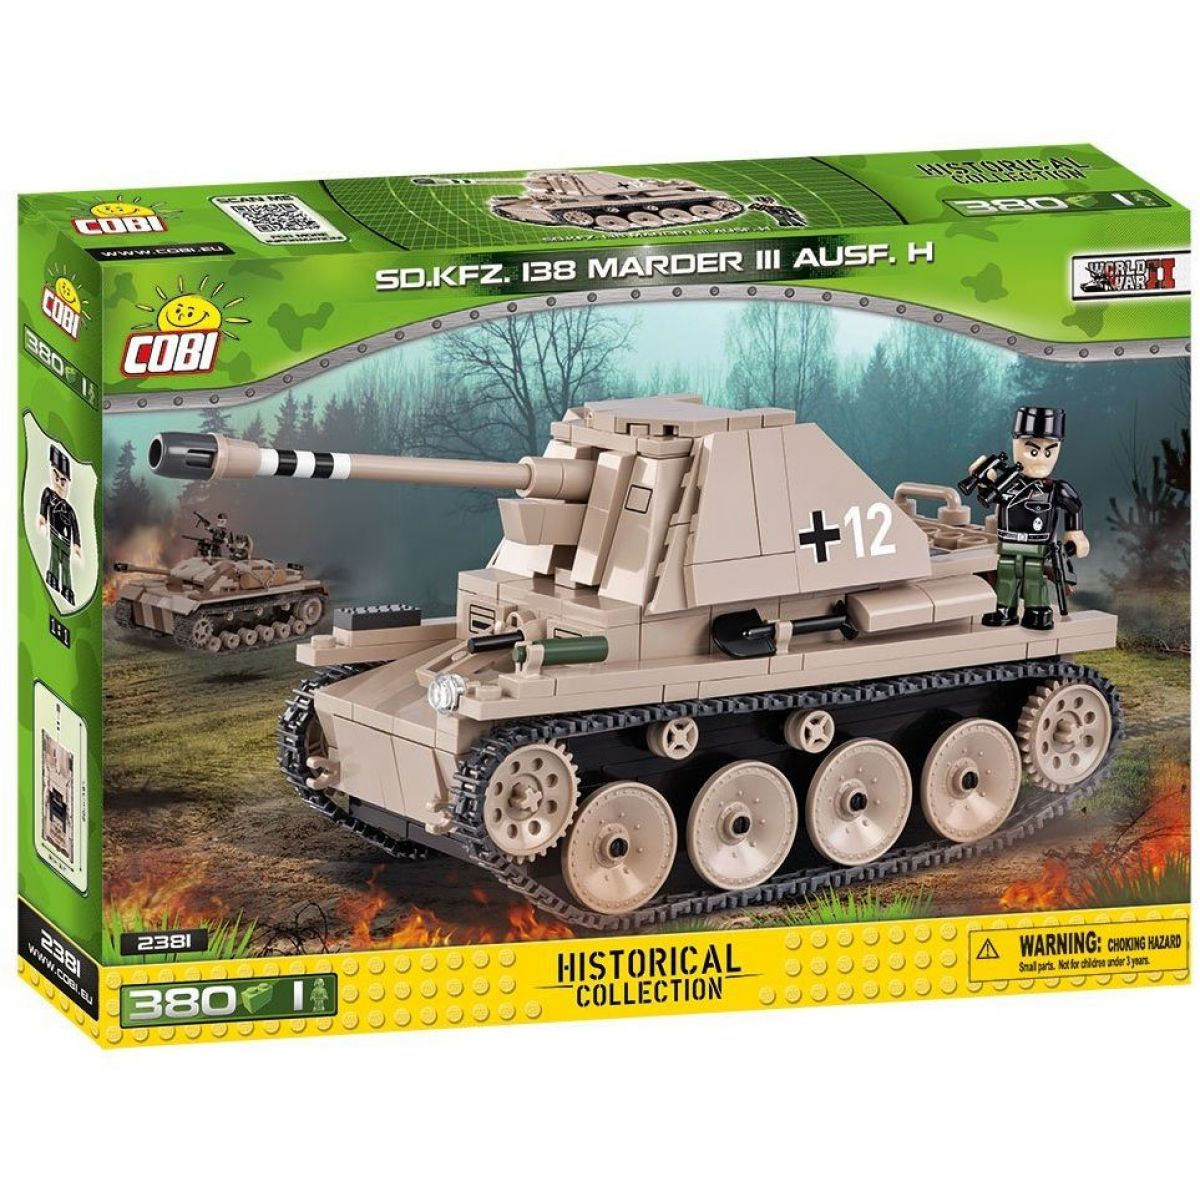 COBI 2381 SMALL ARMY – Sd.Kfz.138 Marder III Ausf.H 380 k 1 f